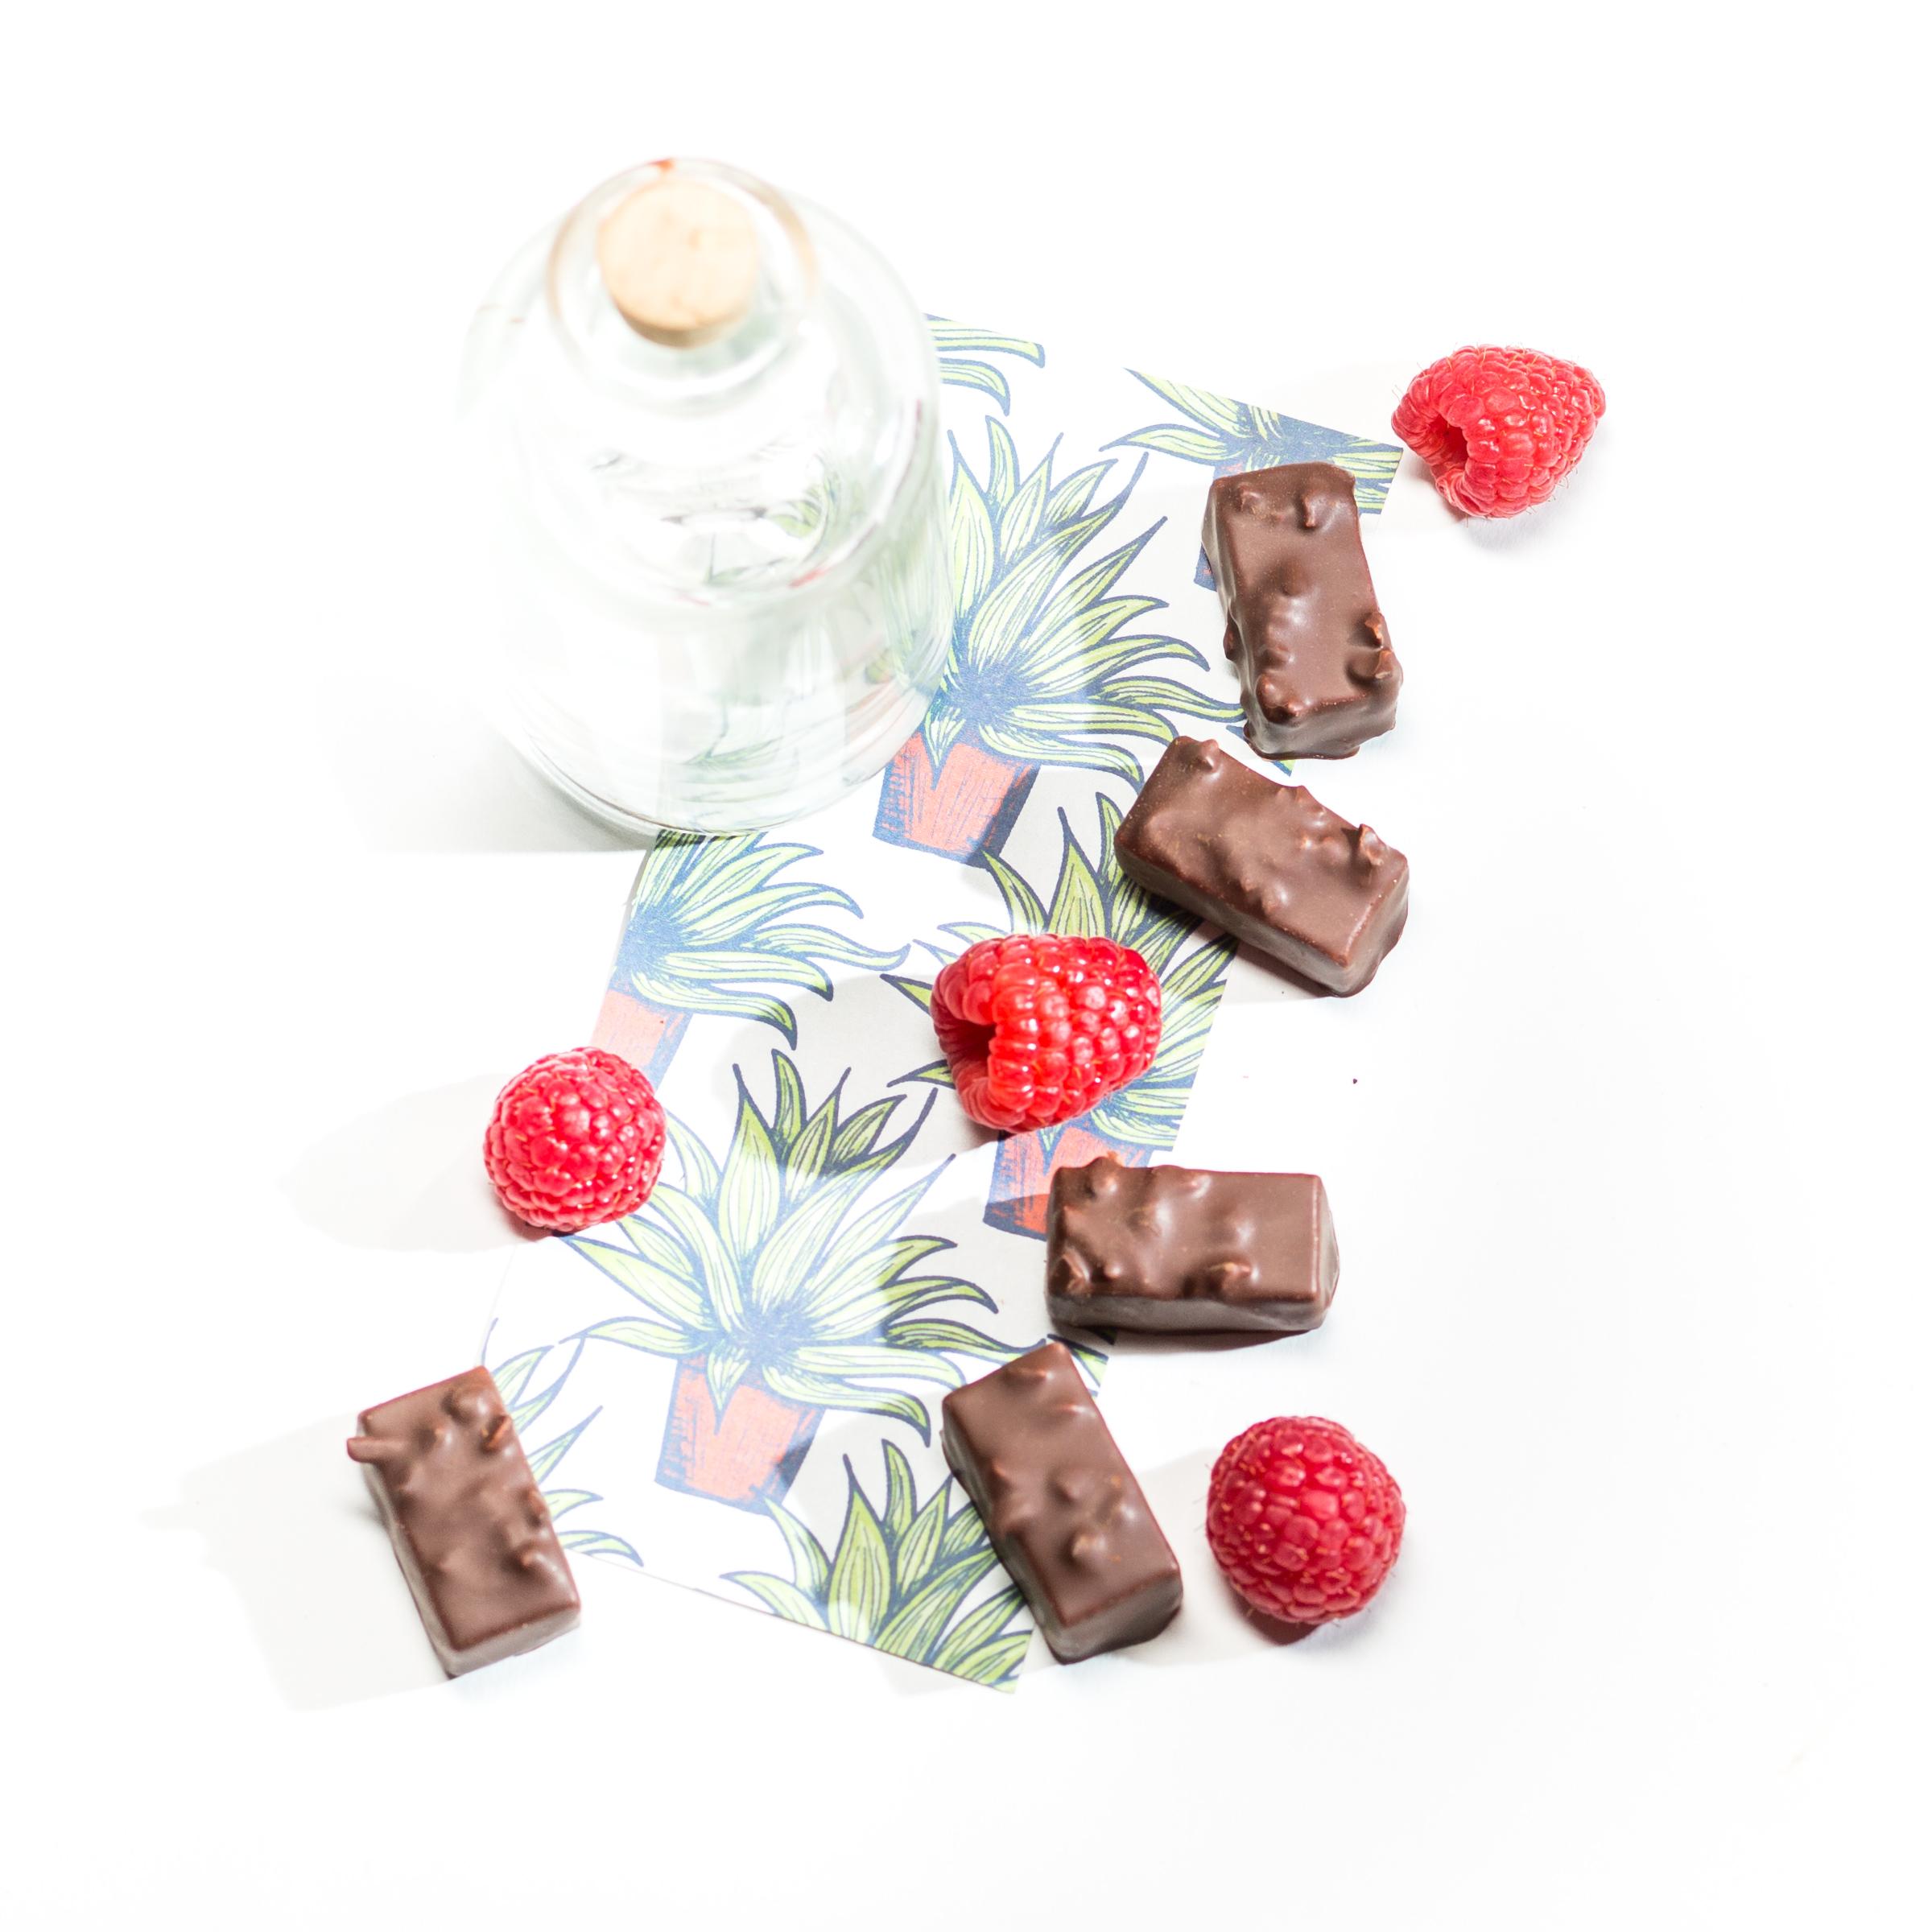 Himbeer Mezcal Schokolade